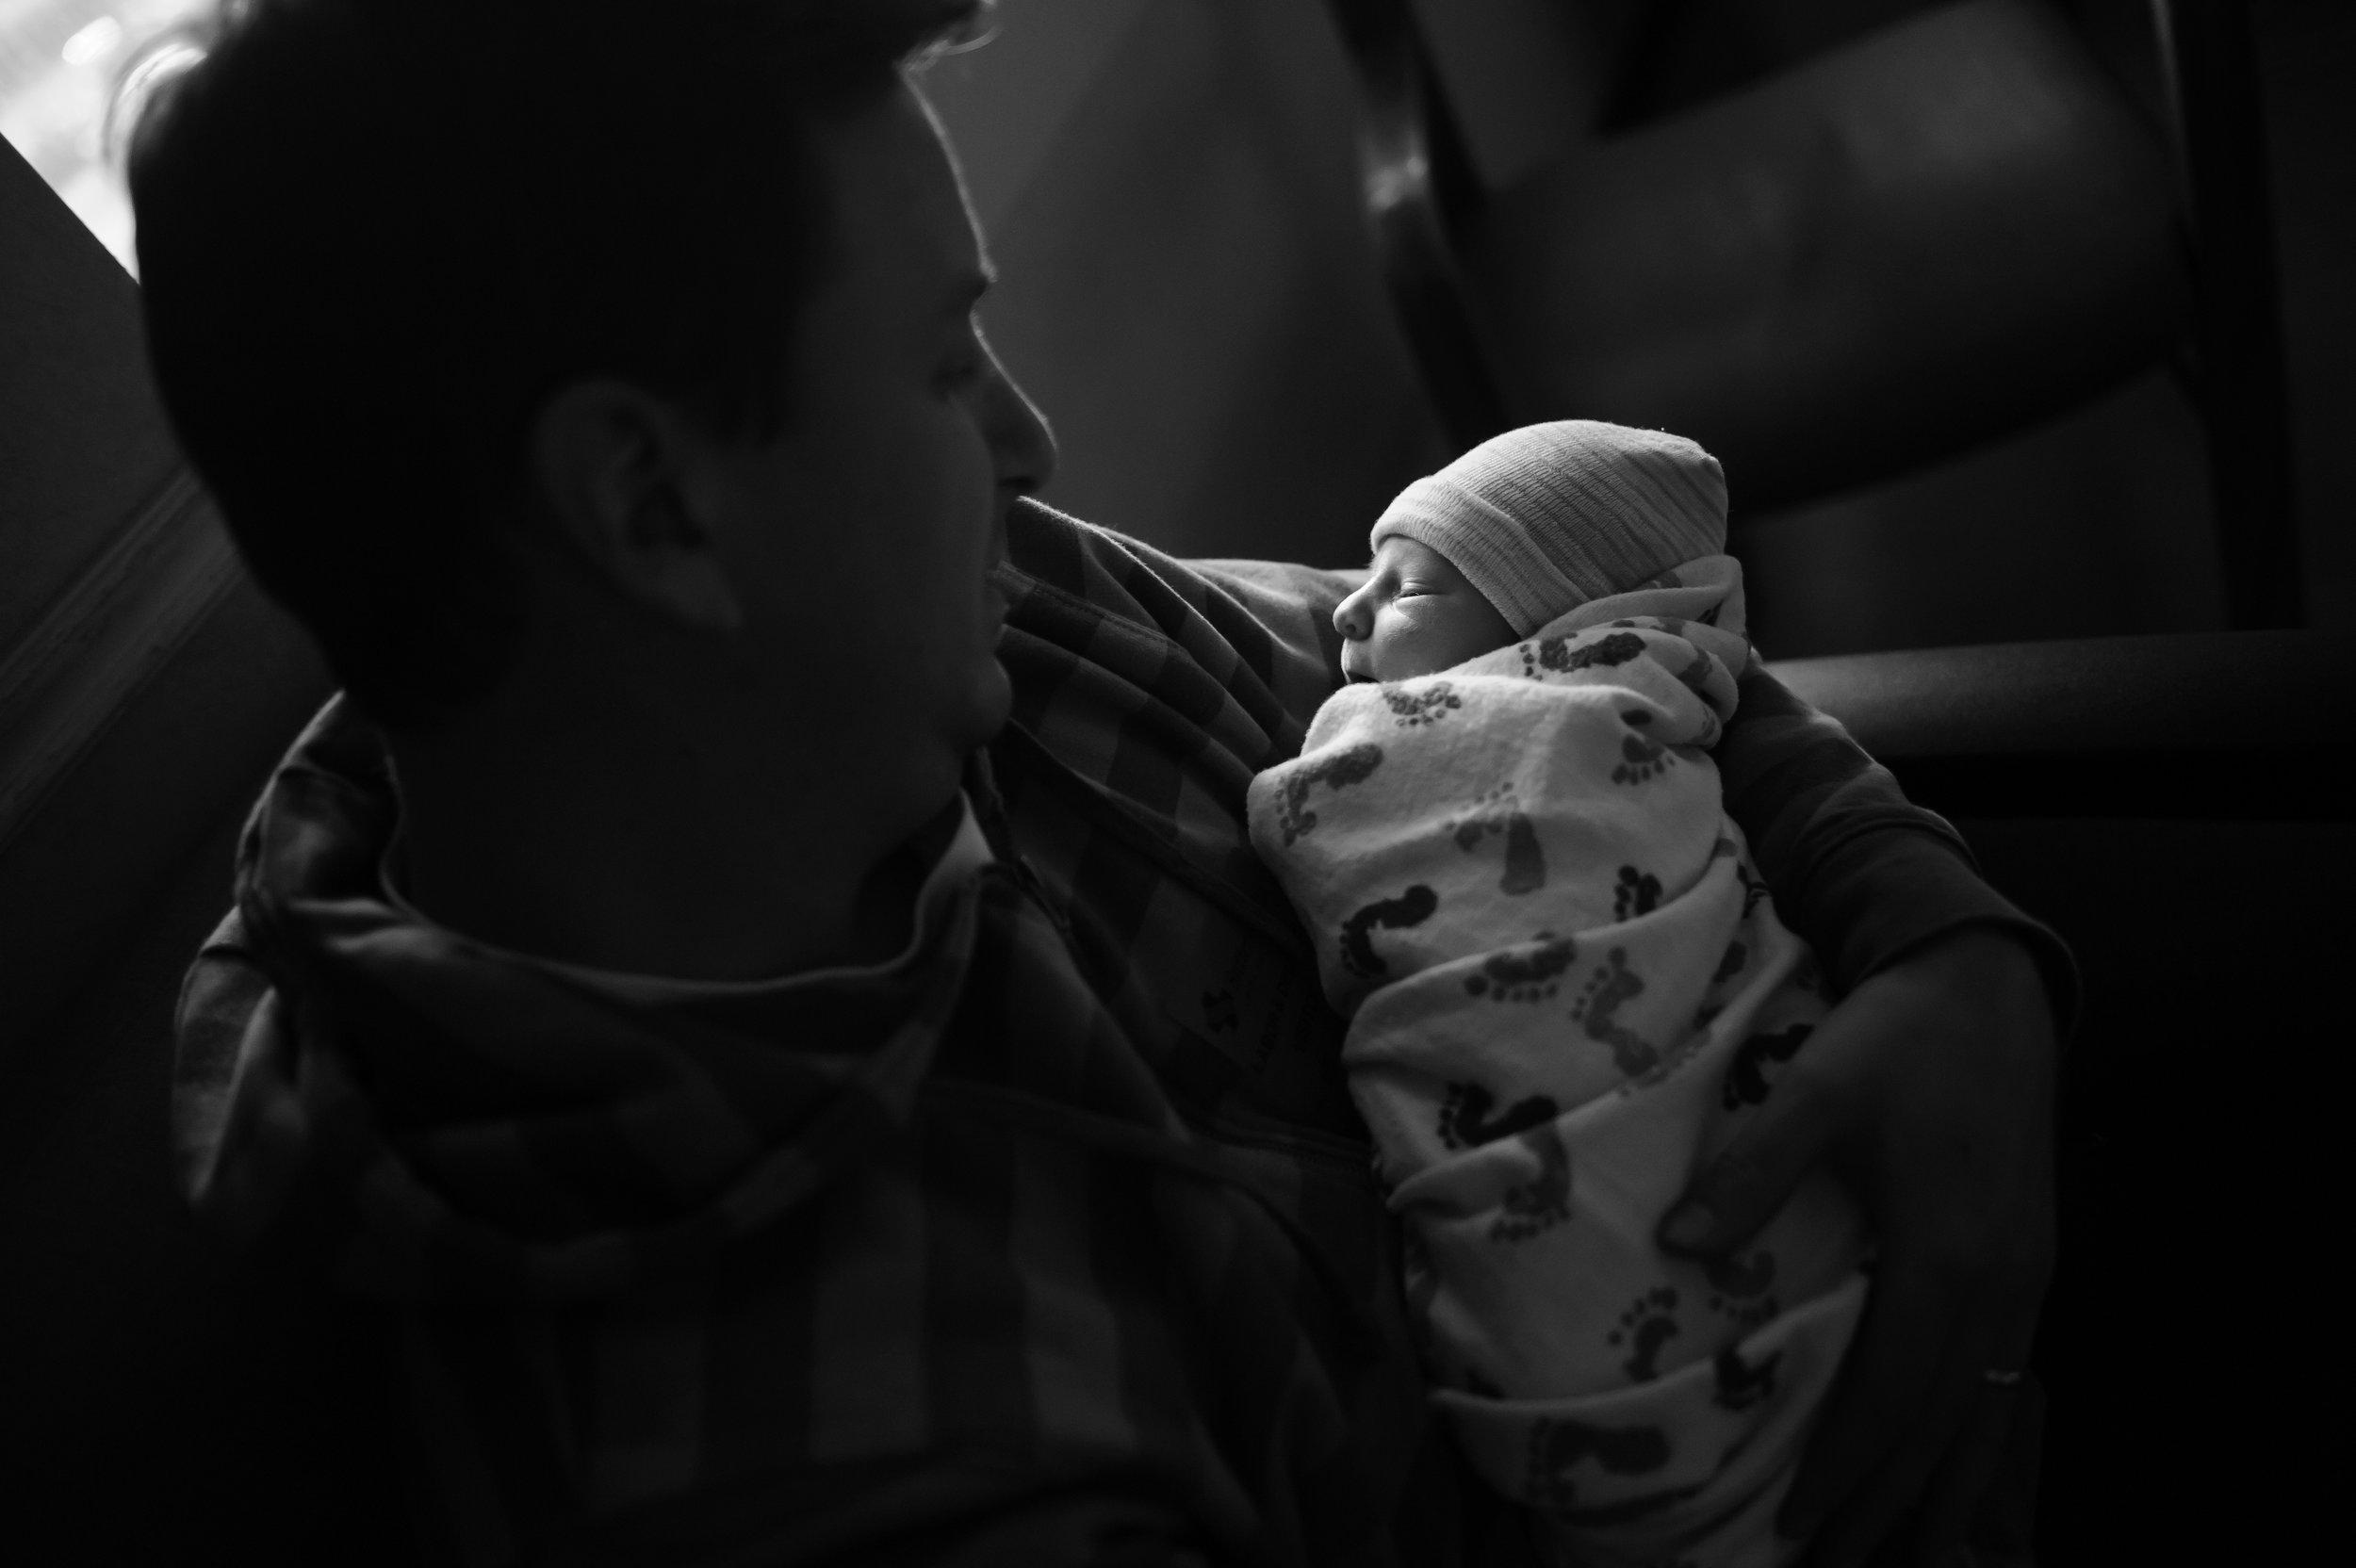 erickson-family-011-sacramento-family-birth-photographer-katherine-nicole-photography.JPG